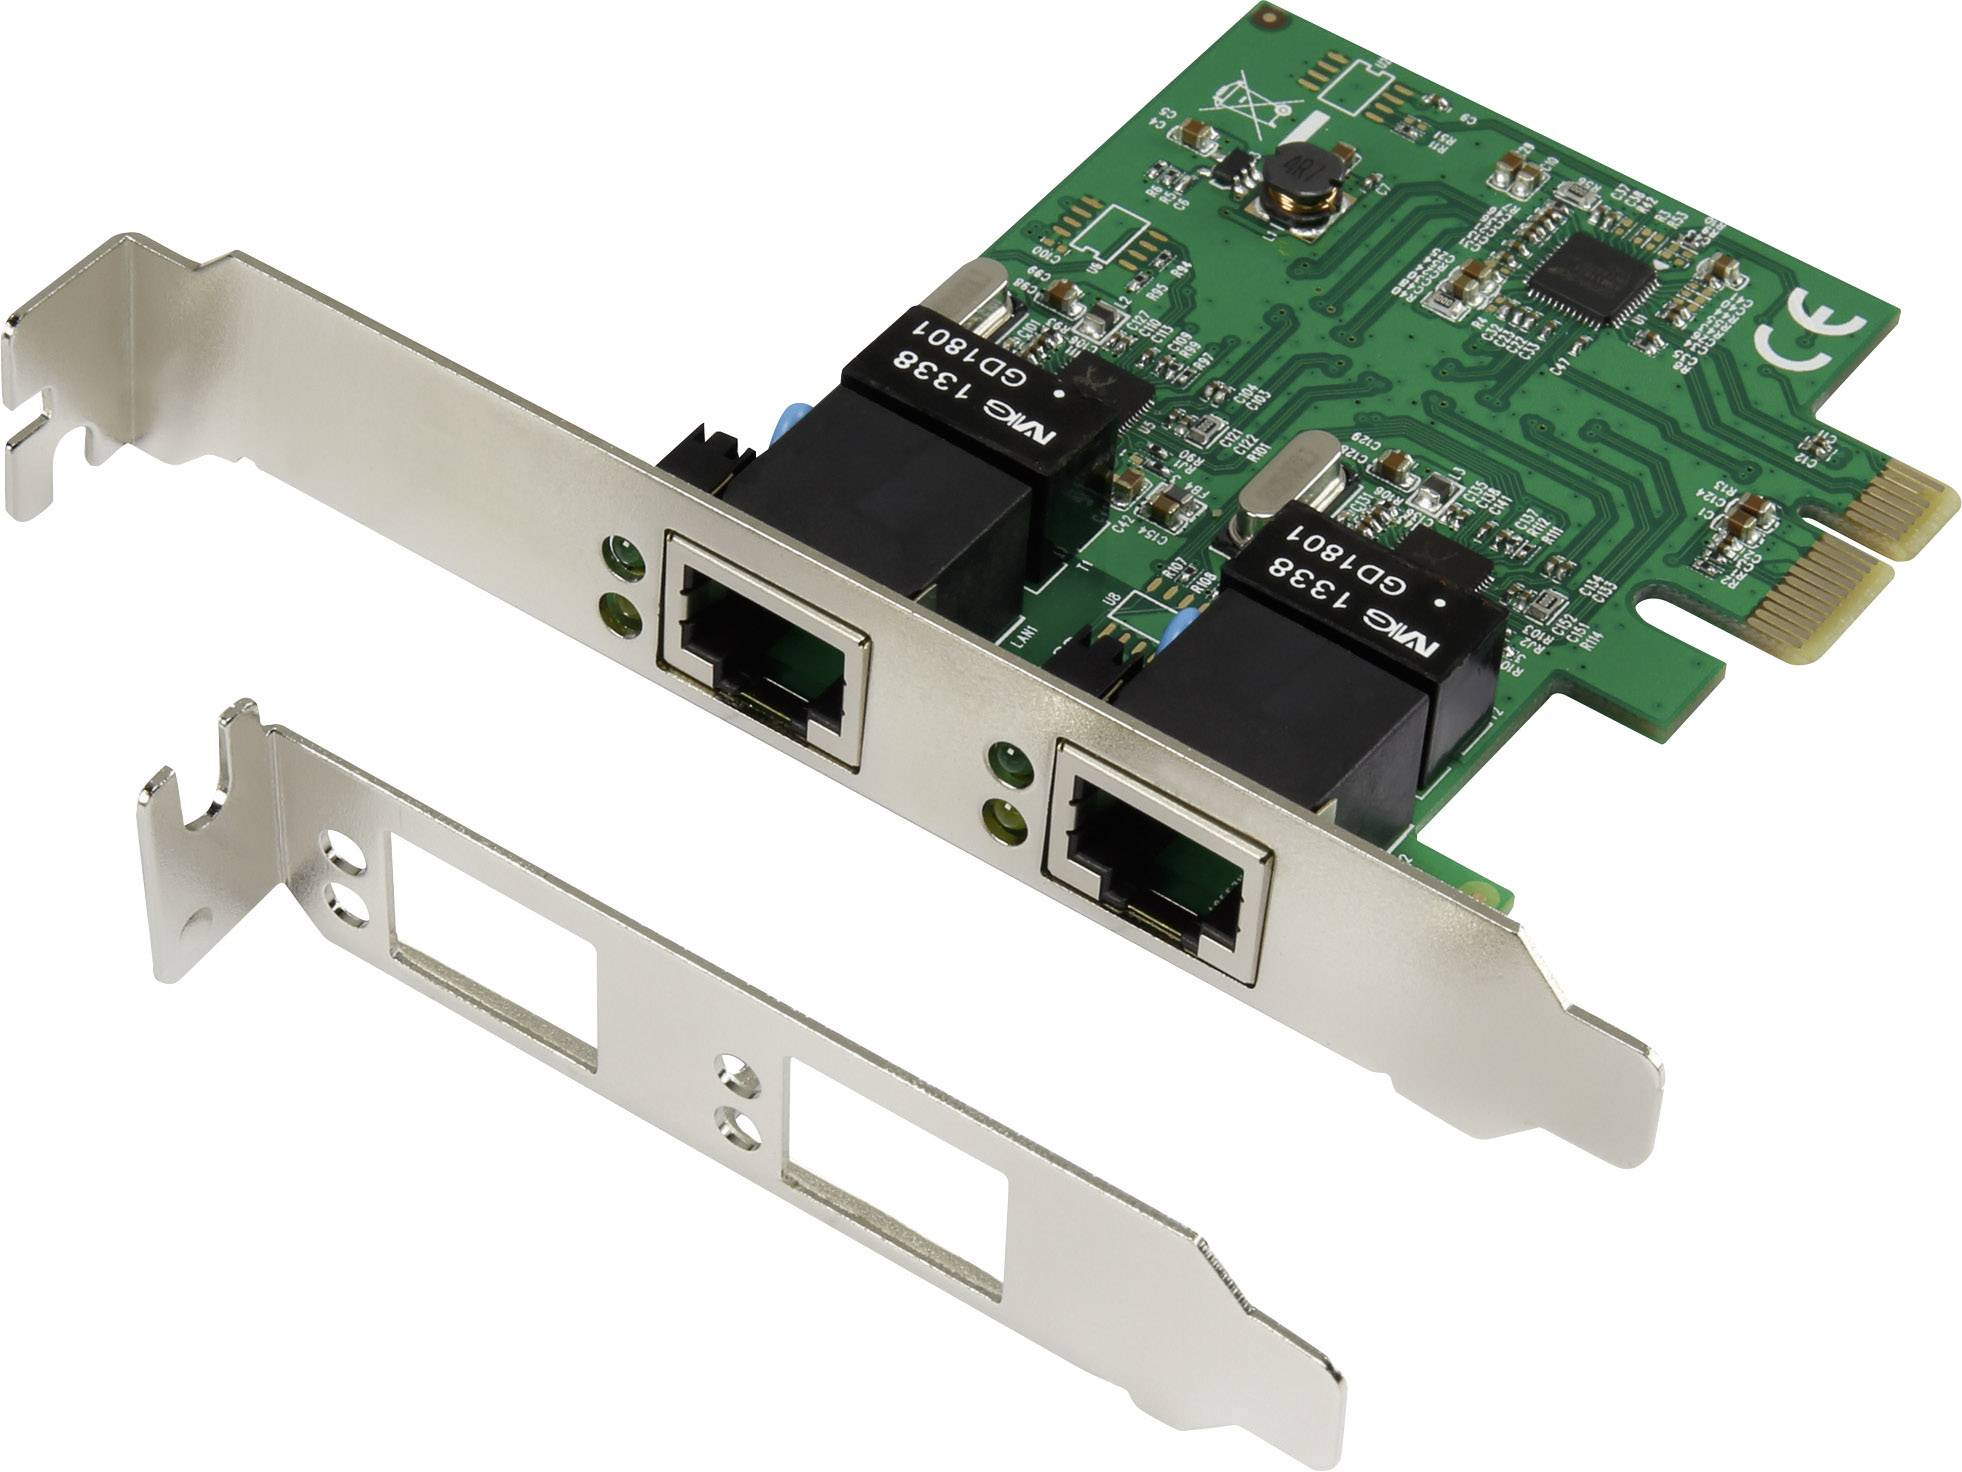 Sieťová karta Renkforce, 1000 MBit/s, LAN (10/100/1000 MBit/s)